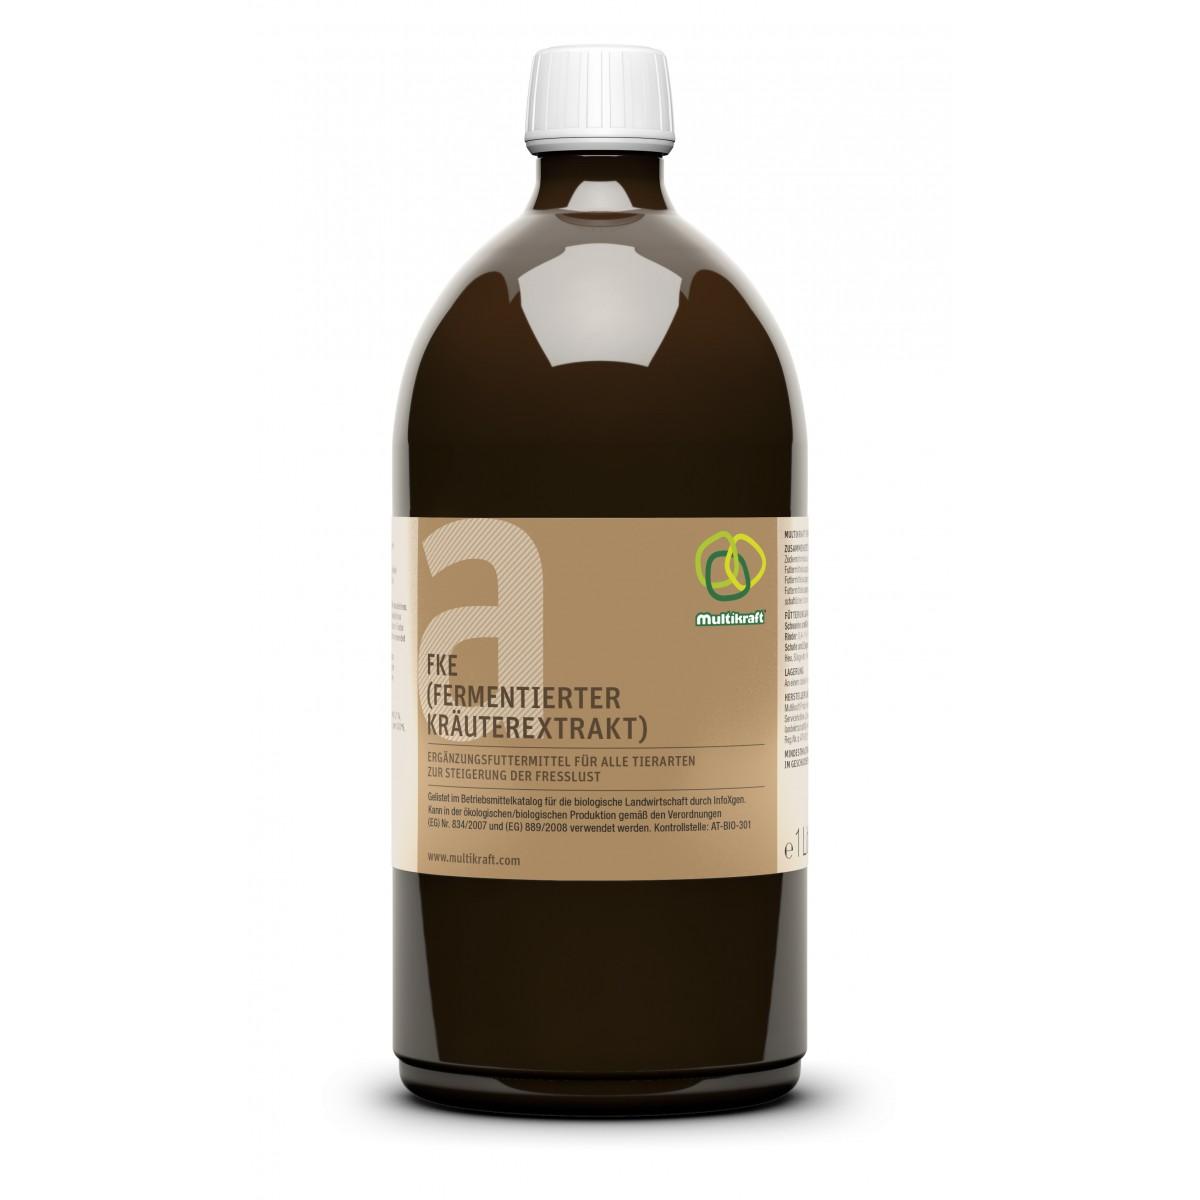 FKE Fermentierter Kräuterextrakt 1 l